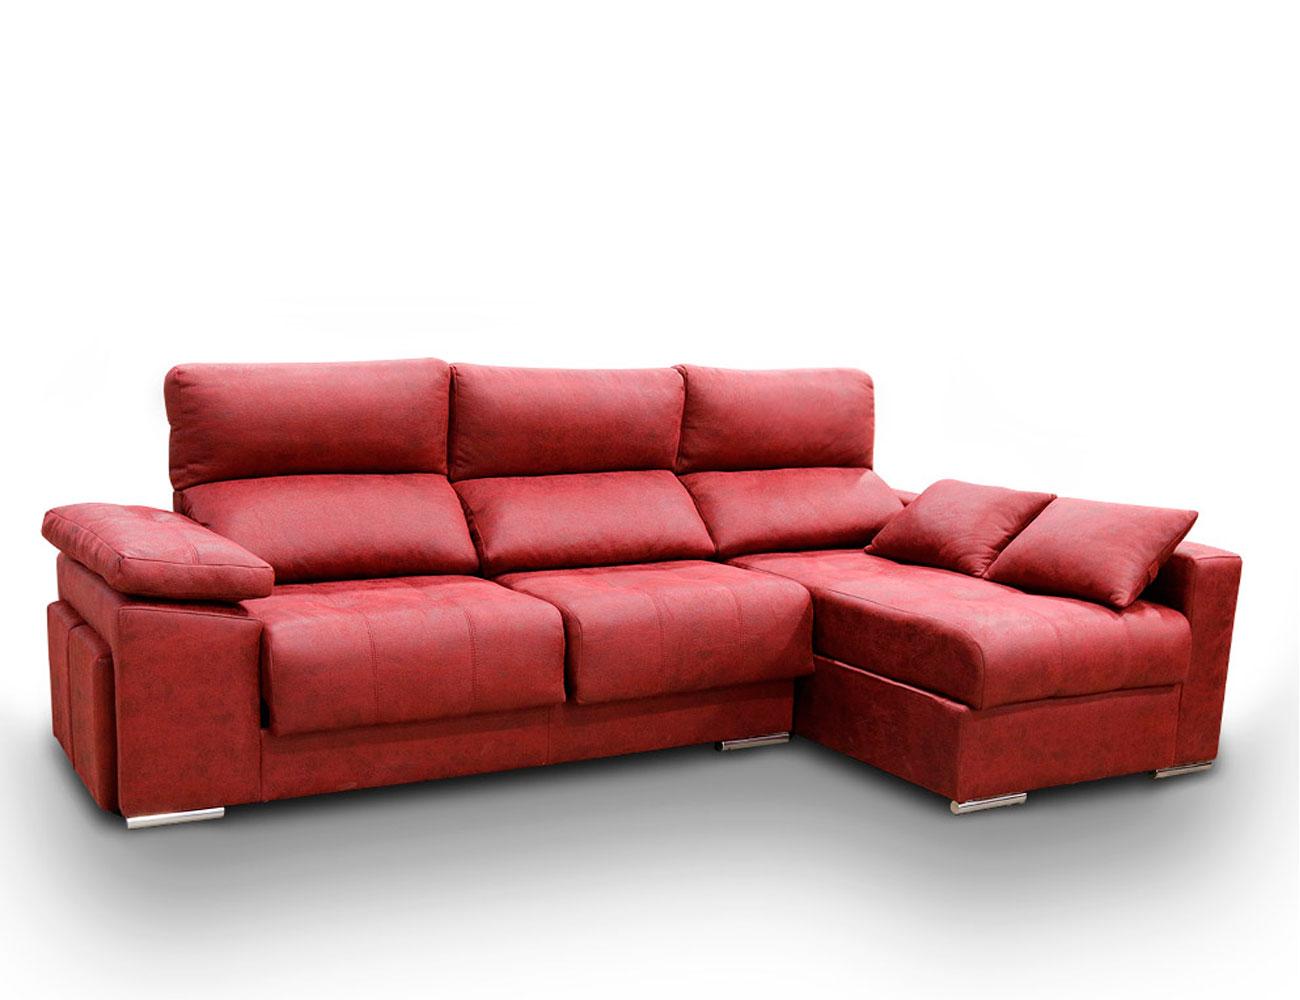 Sofa chaiselongue anti manchas rojo granate18